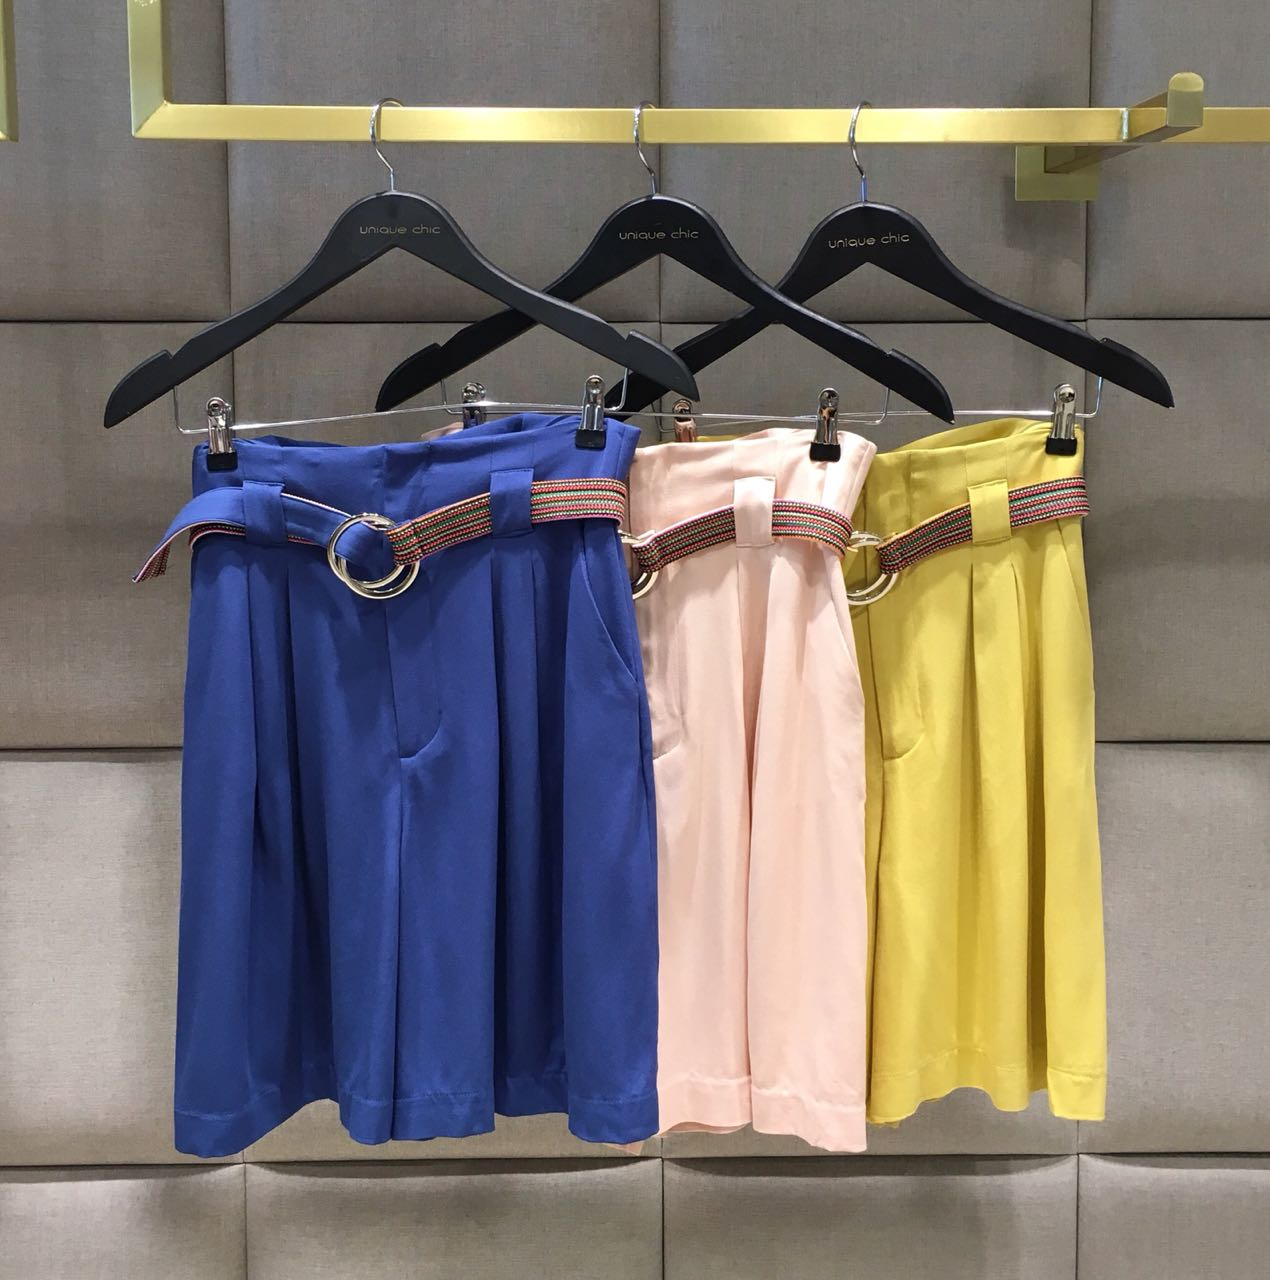 SHORTS GISELE  BERMUDA VISCOSE CINTO COLOR (FORRO ACETATO)  Cores Amarelo e Azul